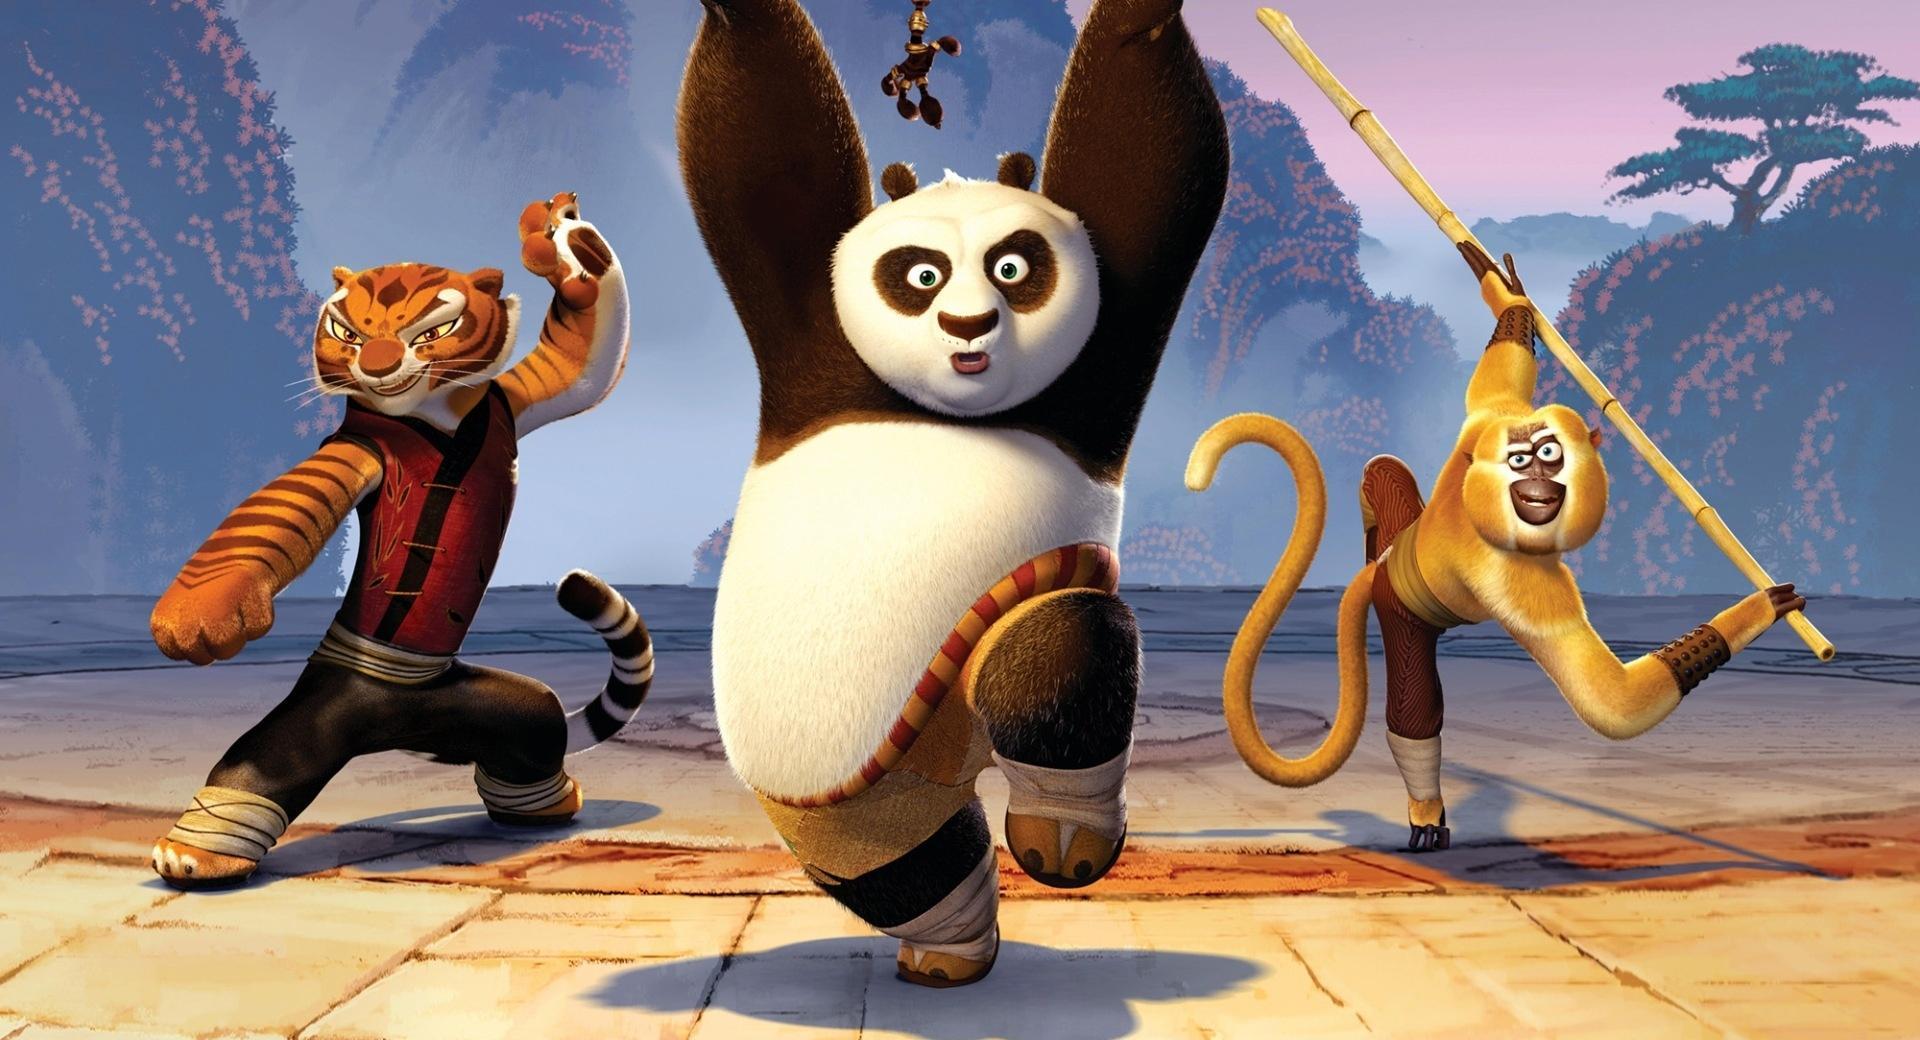 Kung Fu Panda 2 Movie wallpapers HD quality